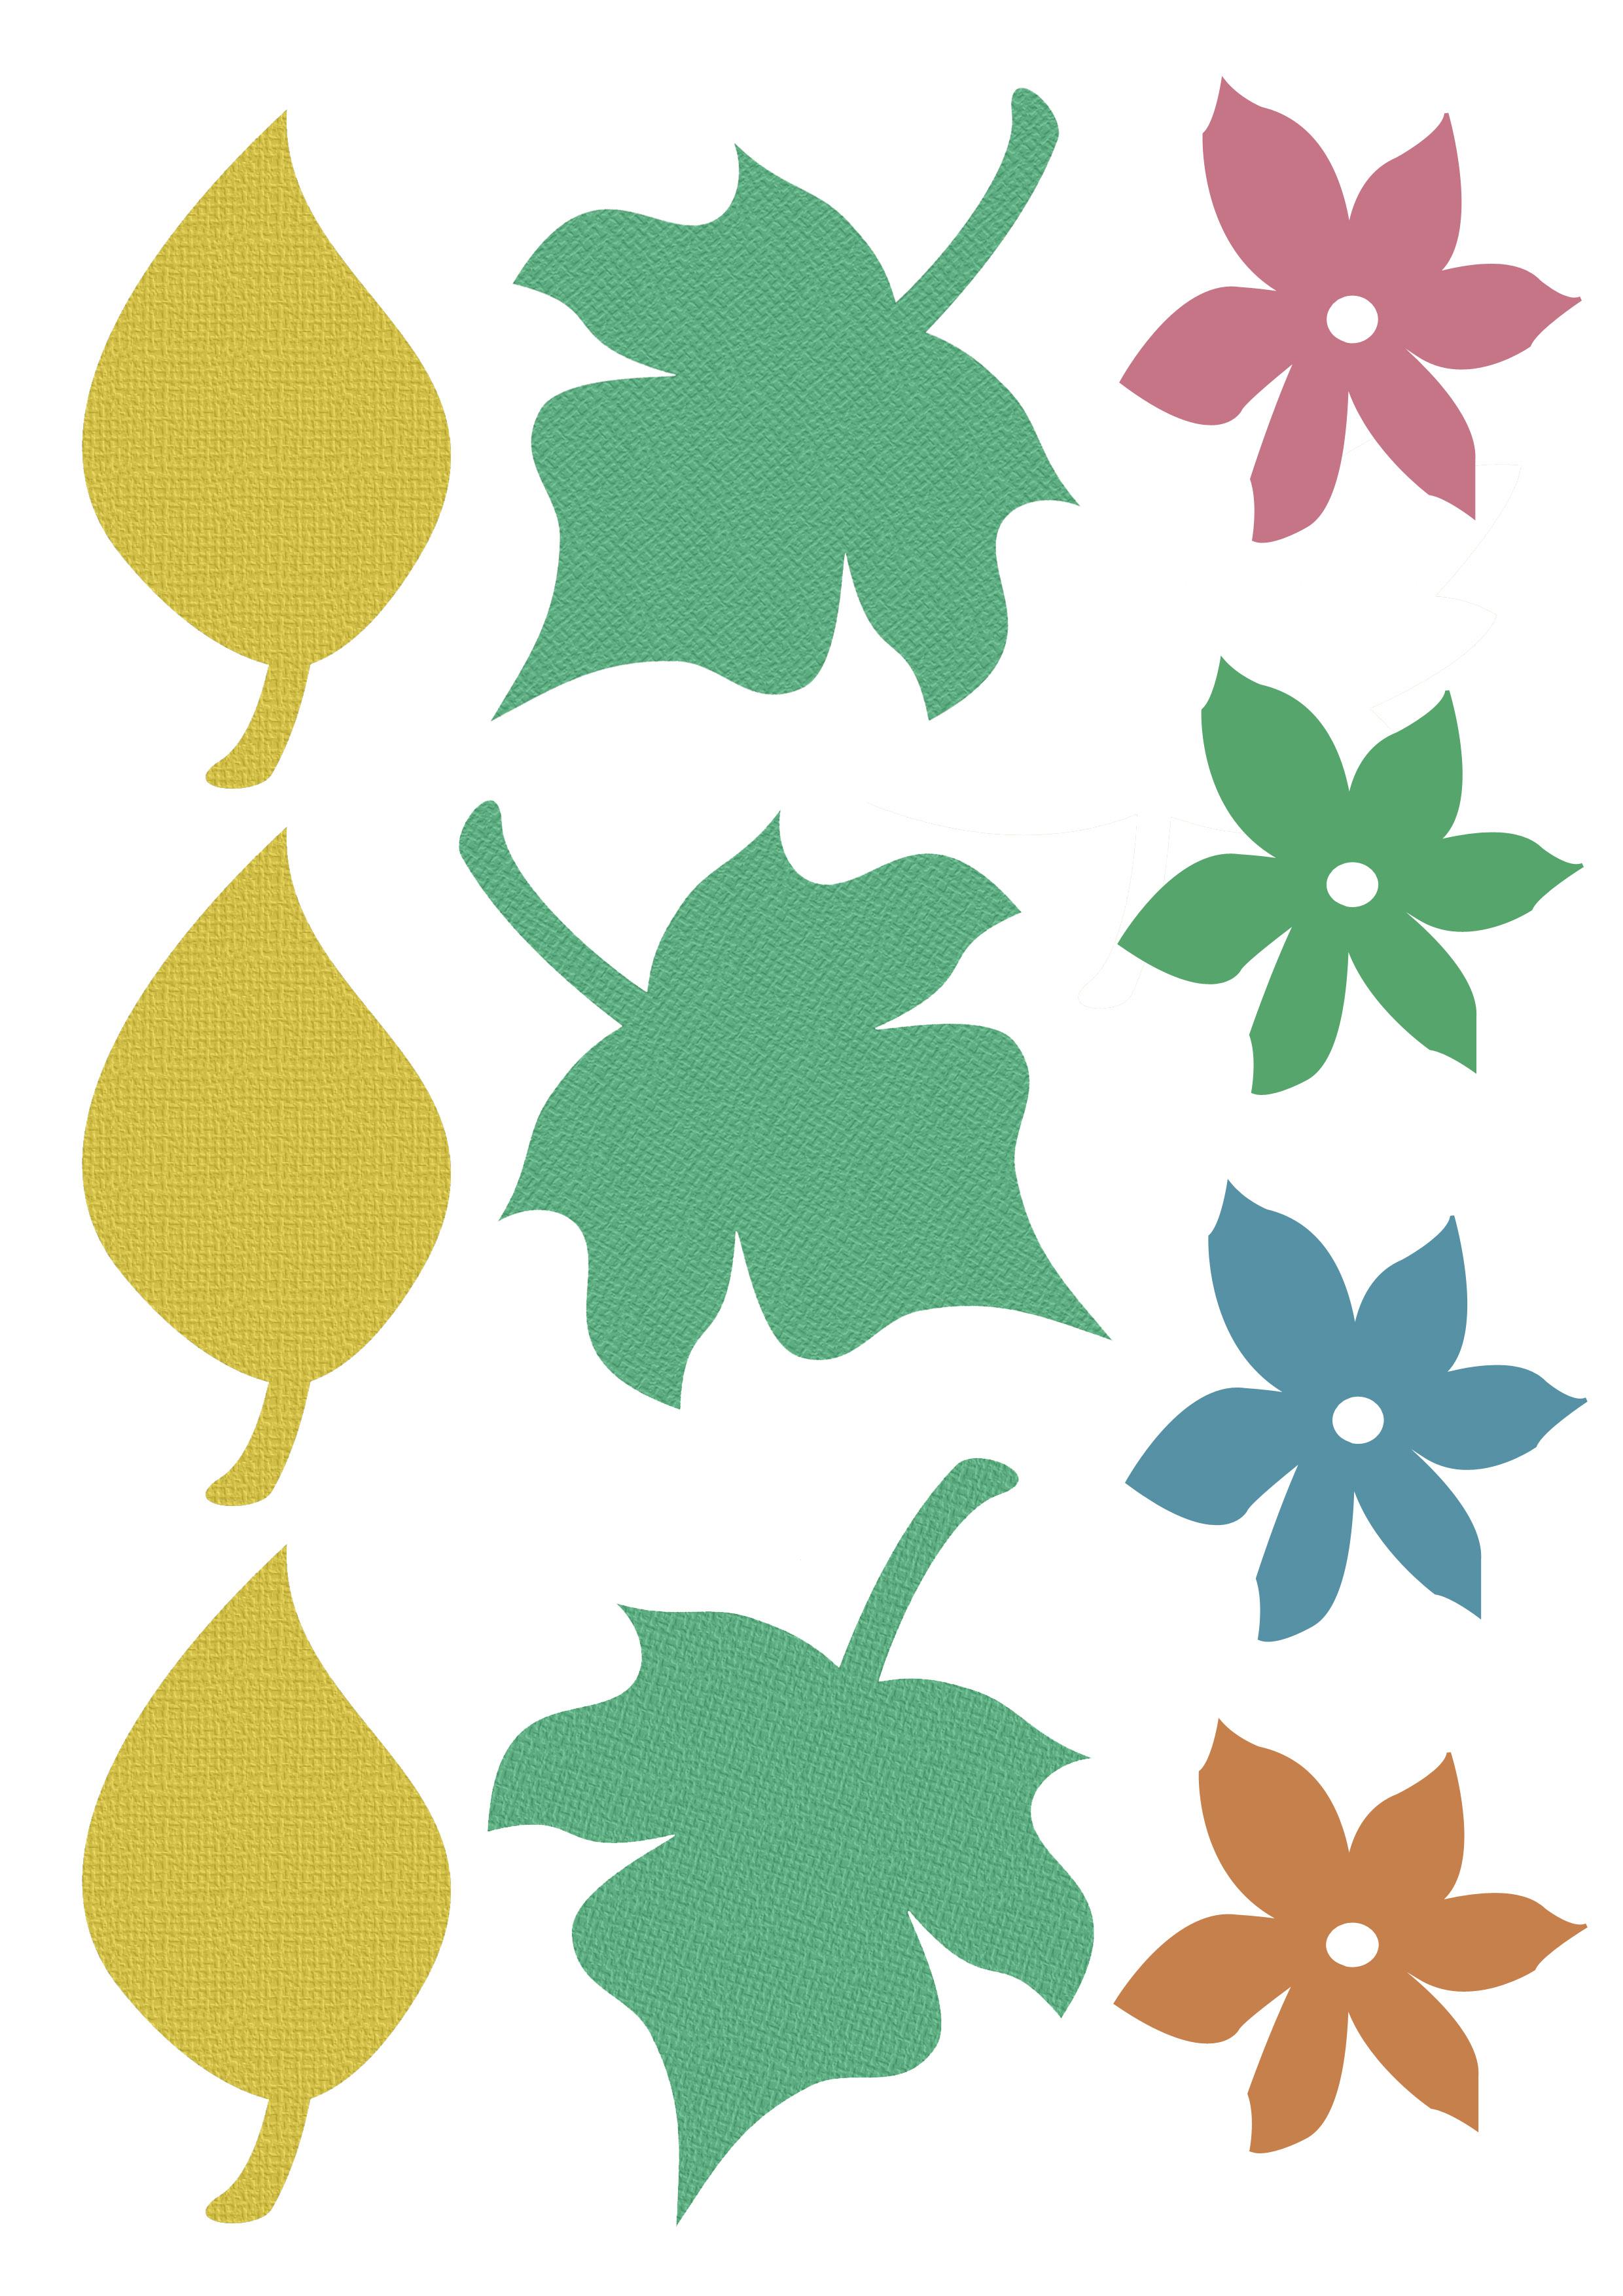 6 Images of Thankful Tree Printable Leaves